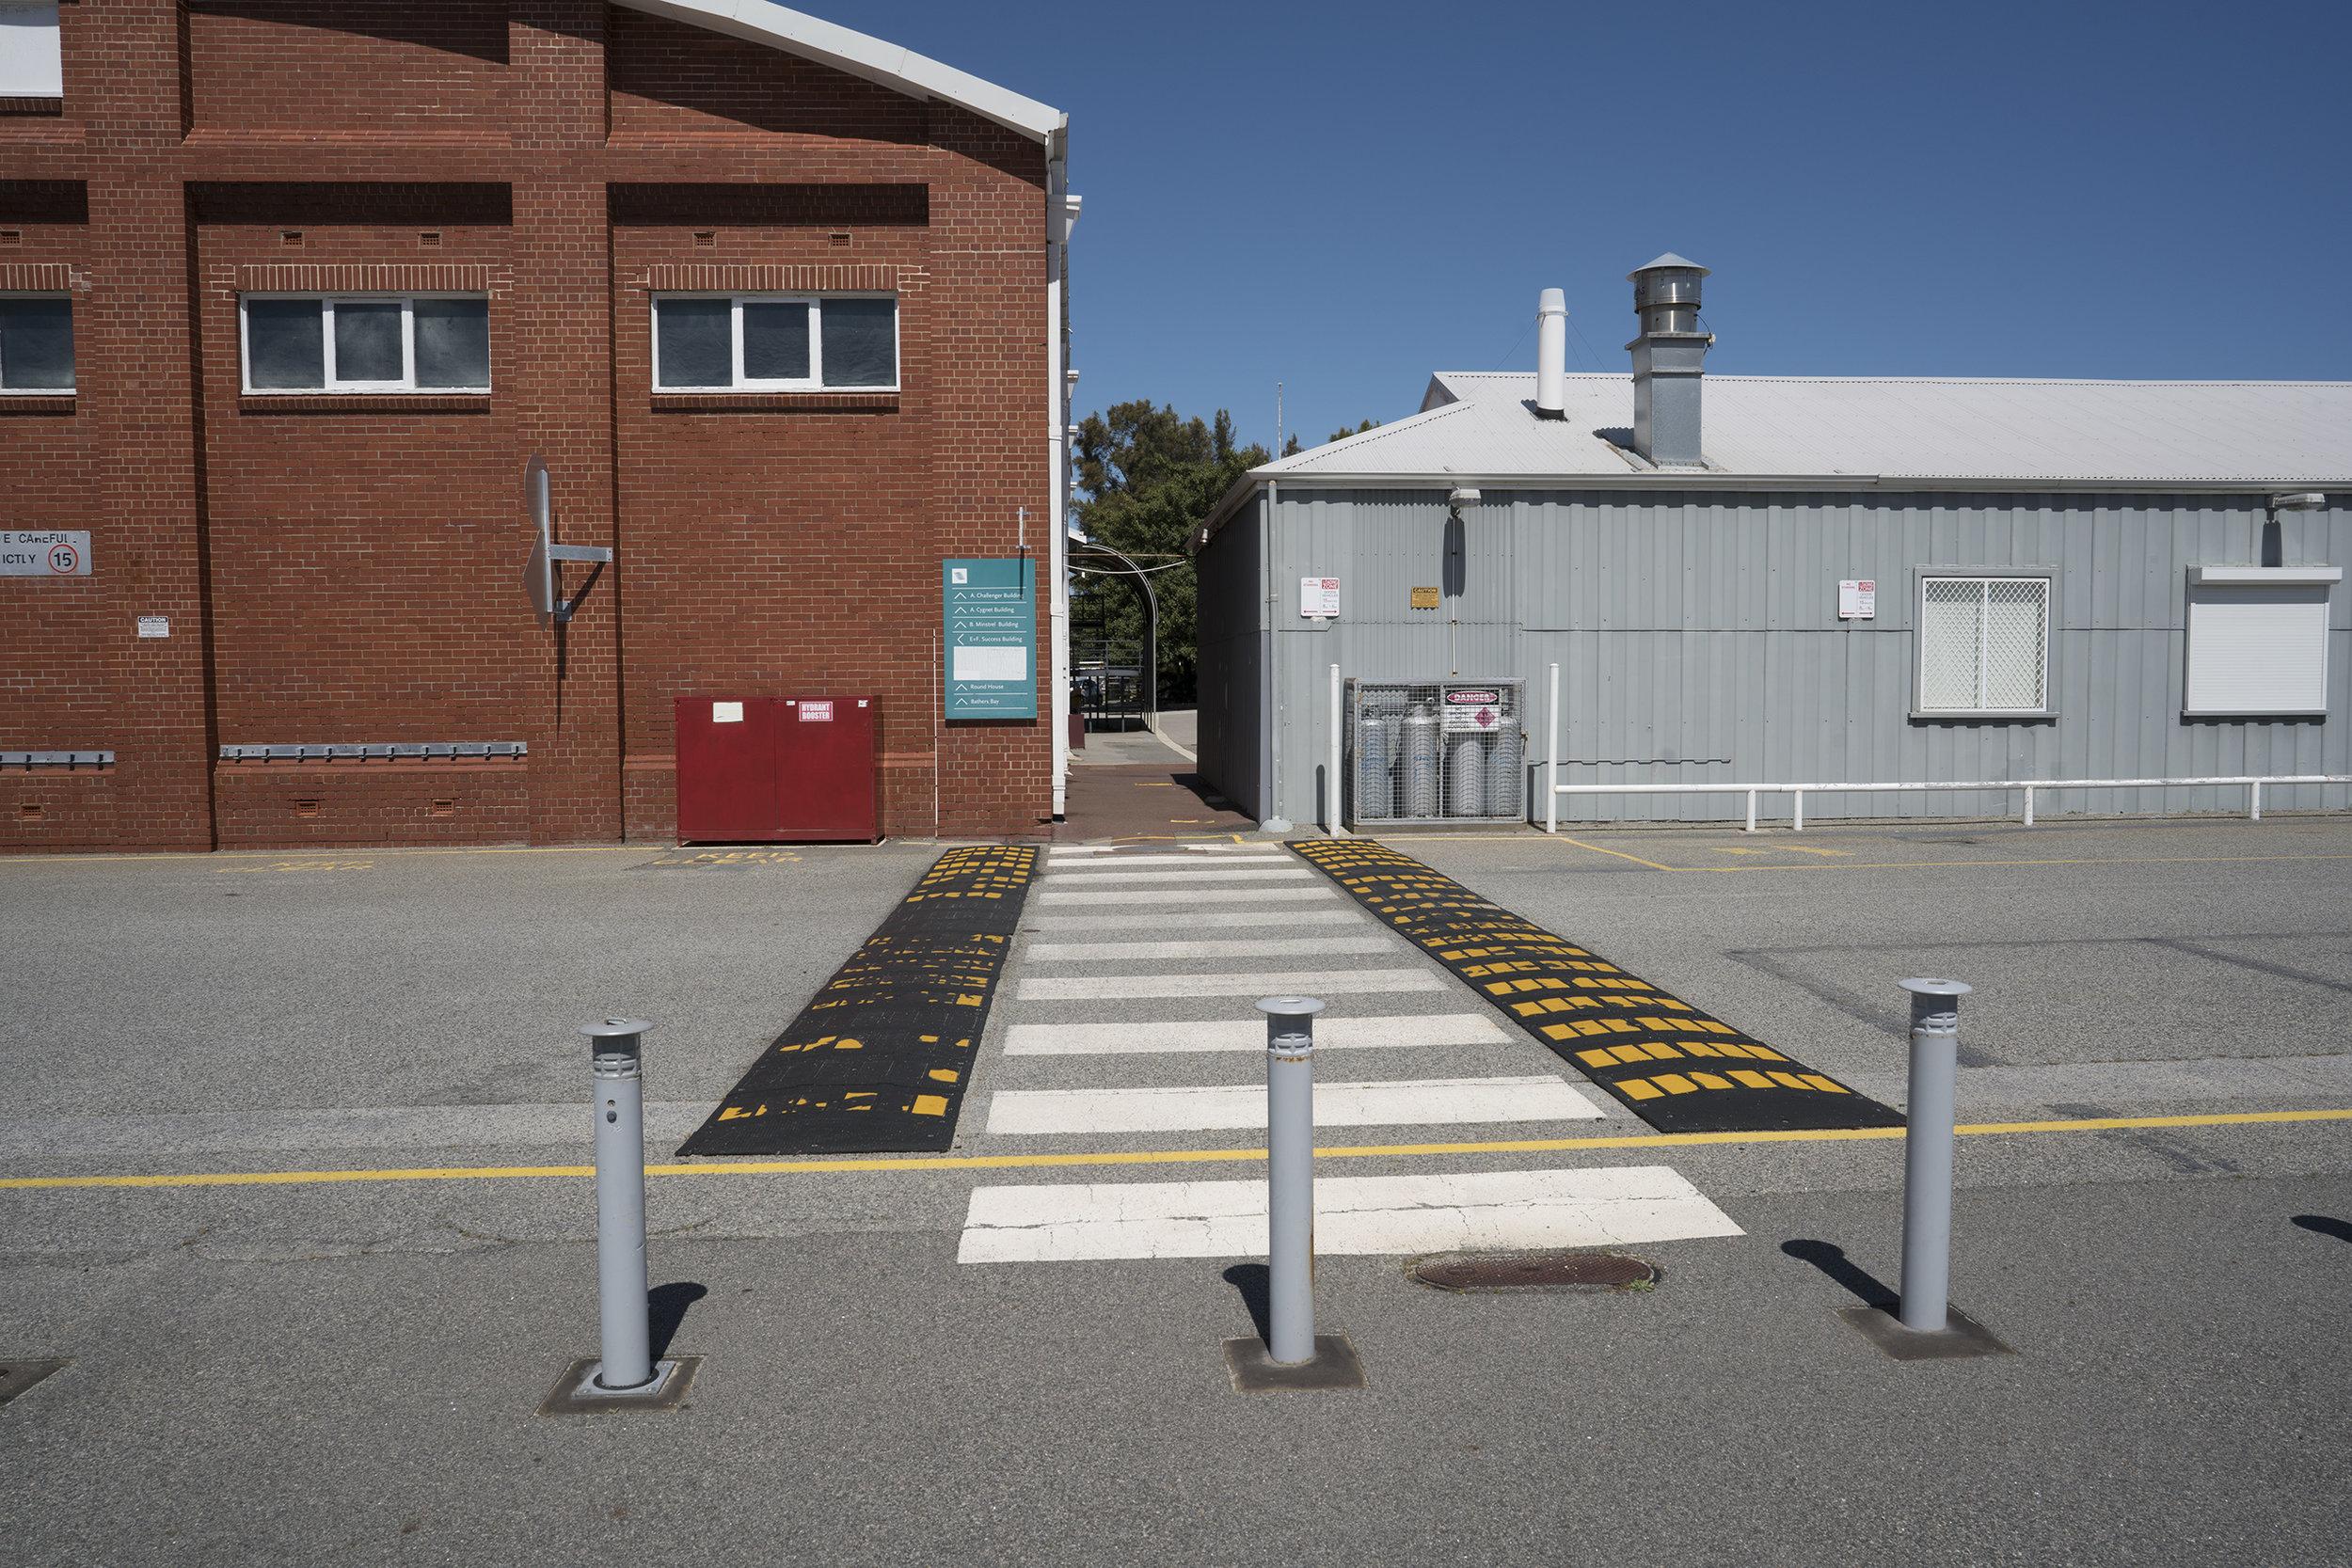 Plate 6: The paths through Maritime Training Centre